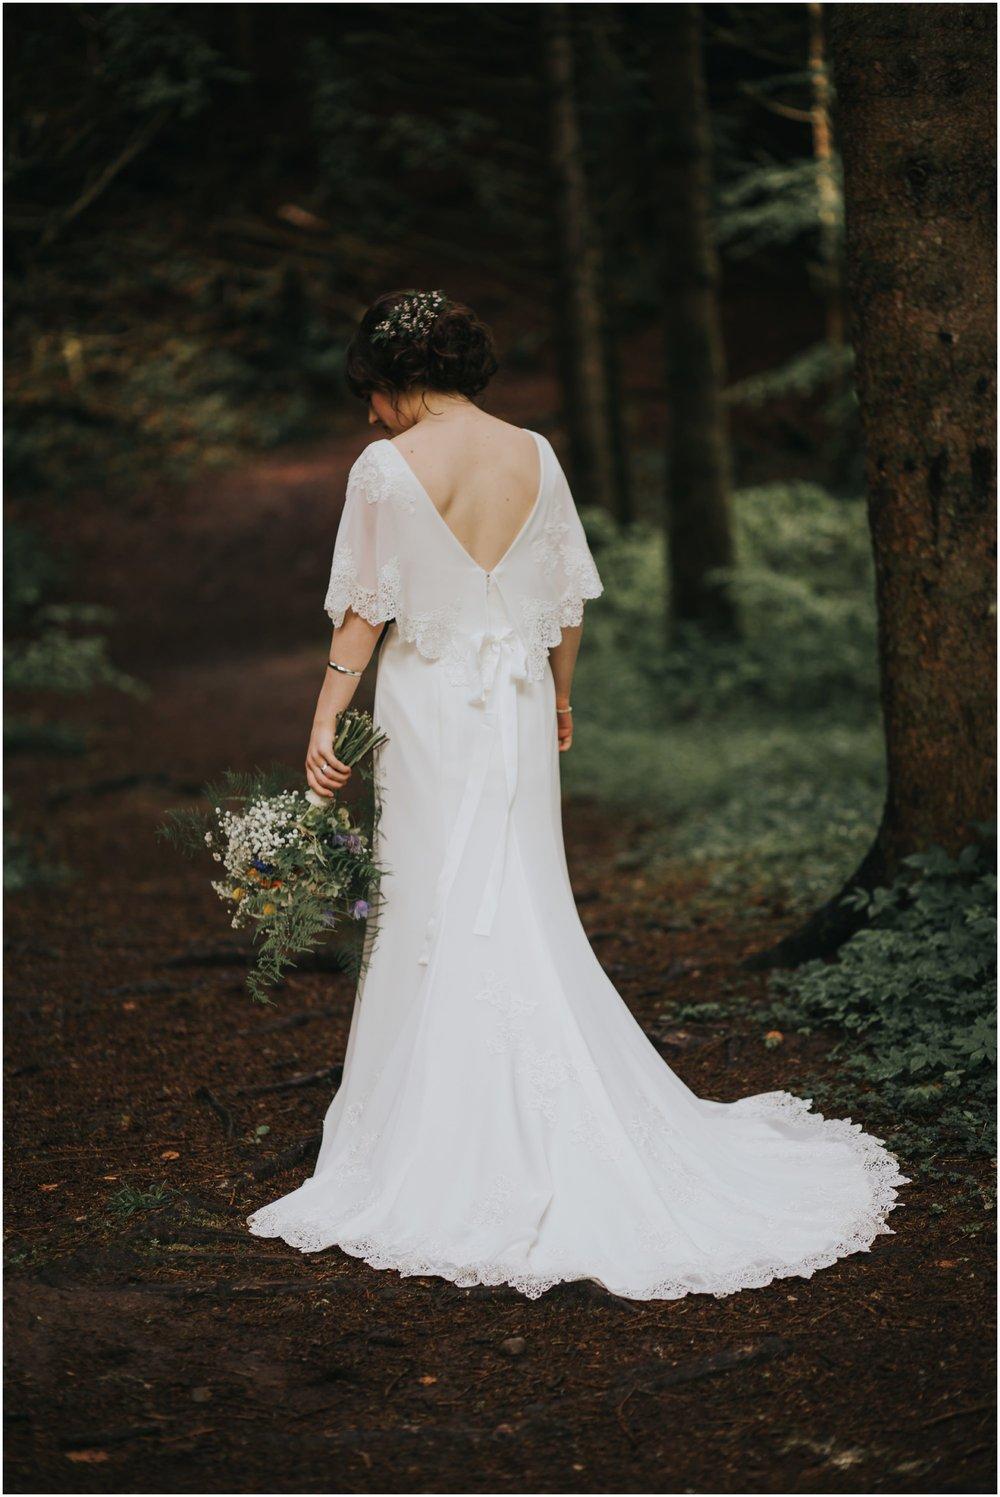 Andy Eilidh Photography 78 Glasgow Wedding Photographer Strathpeffer Pavillion Wedding_0051.jpg